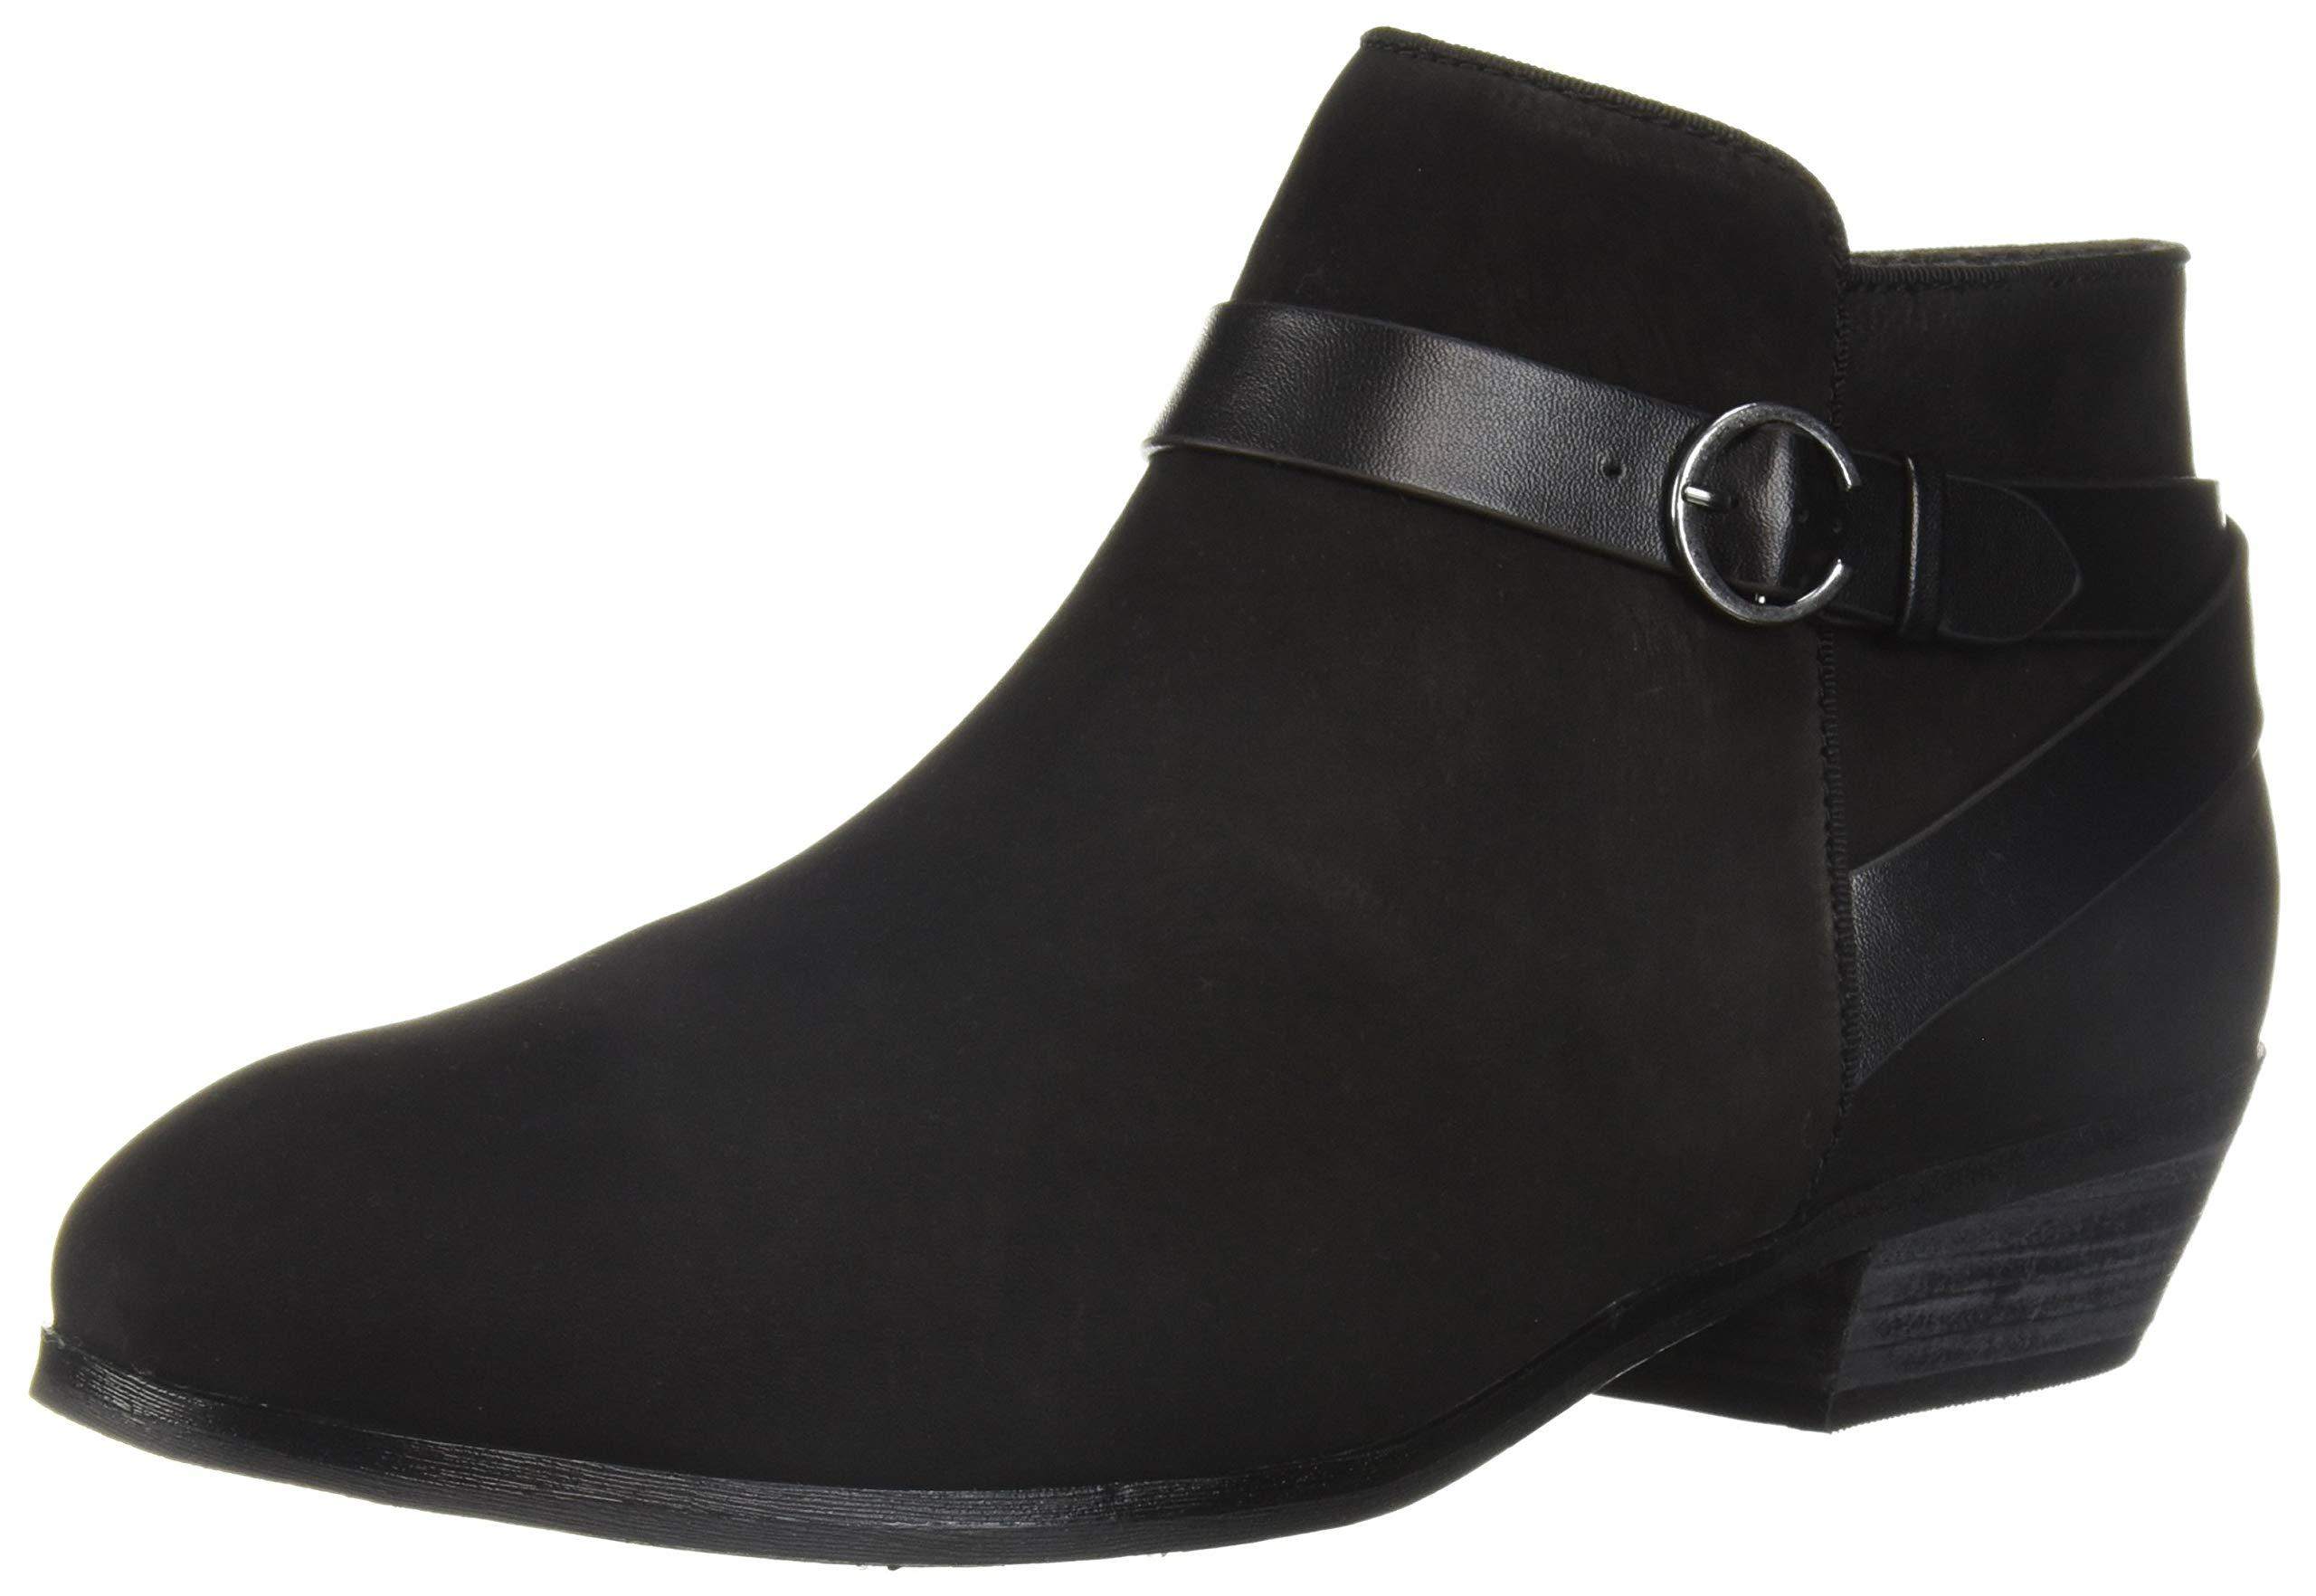 SoftWalk Women's Raven Ankle Boot, Black Nubuck, 9.0 M US by SoftWalk